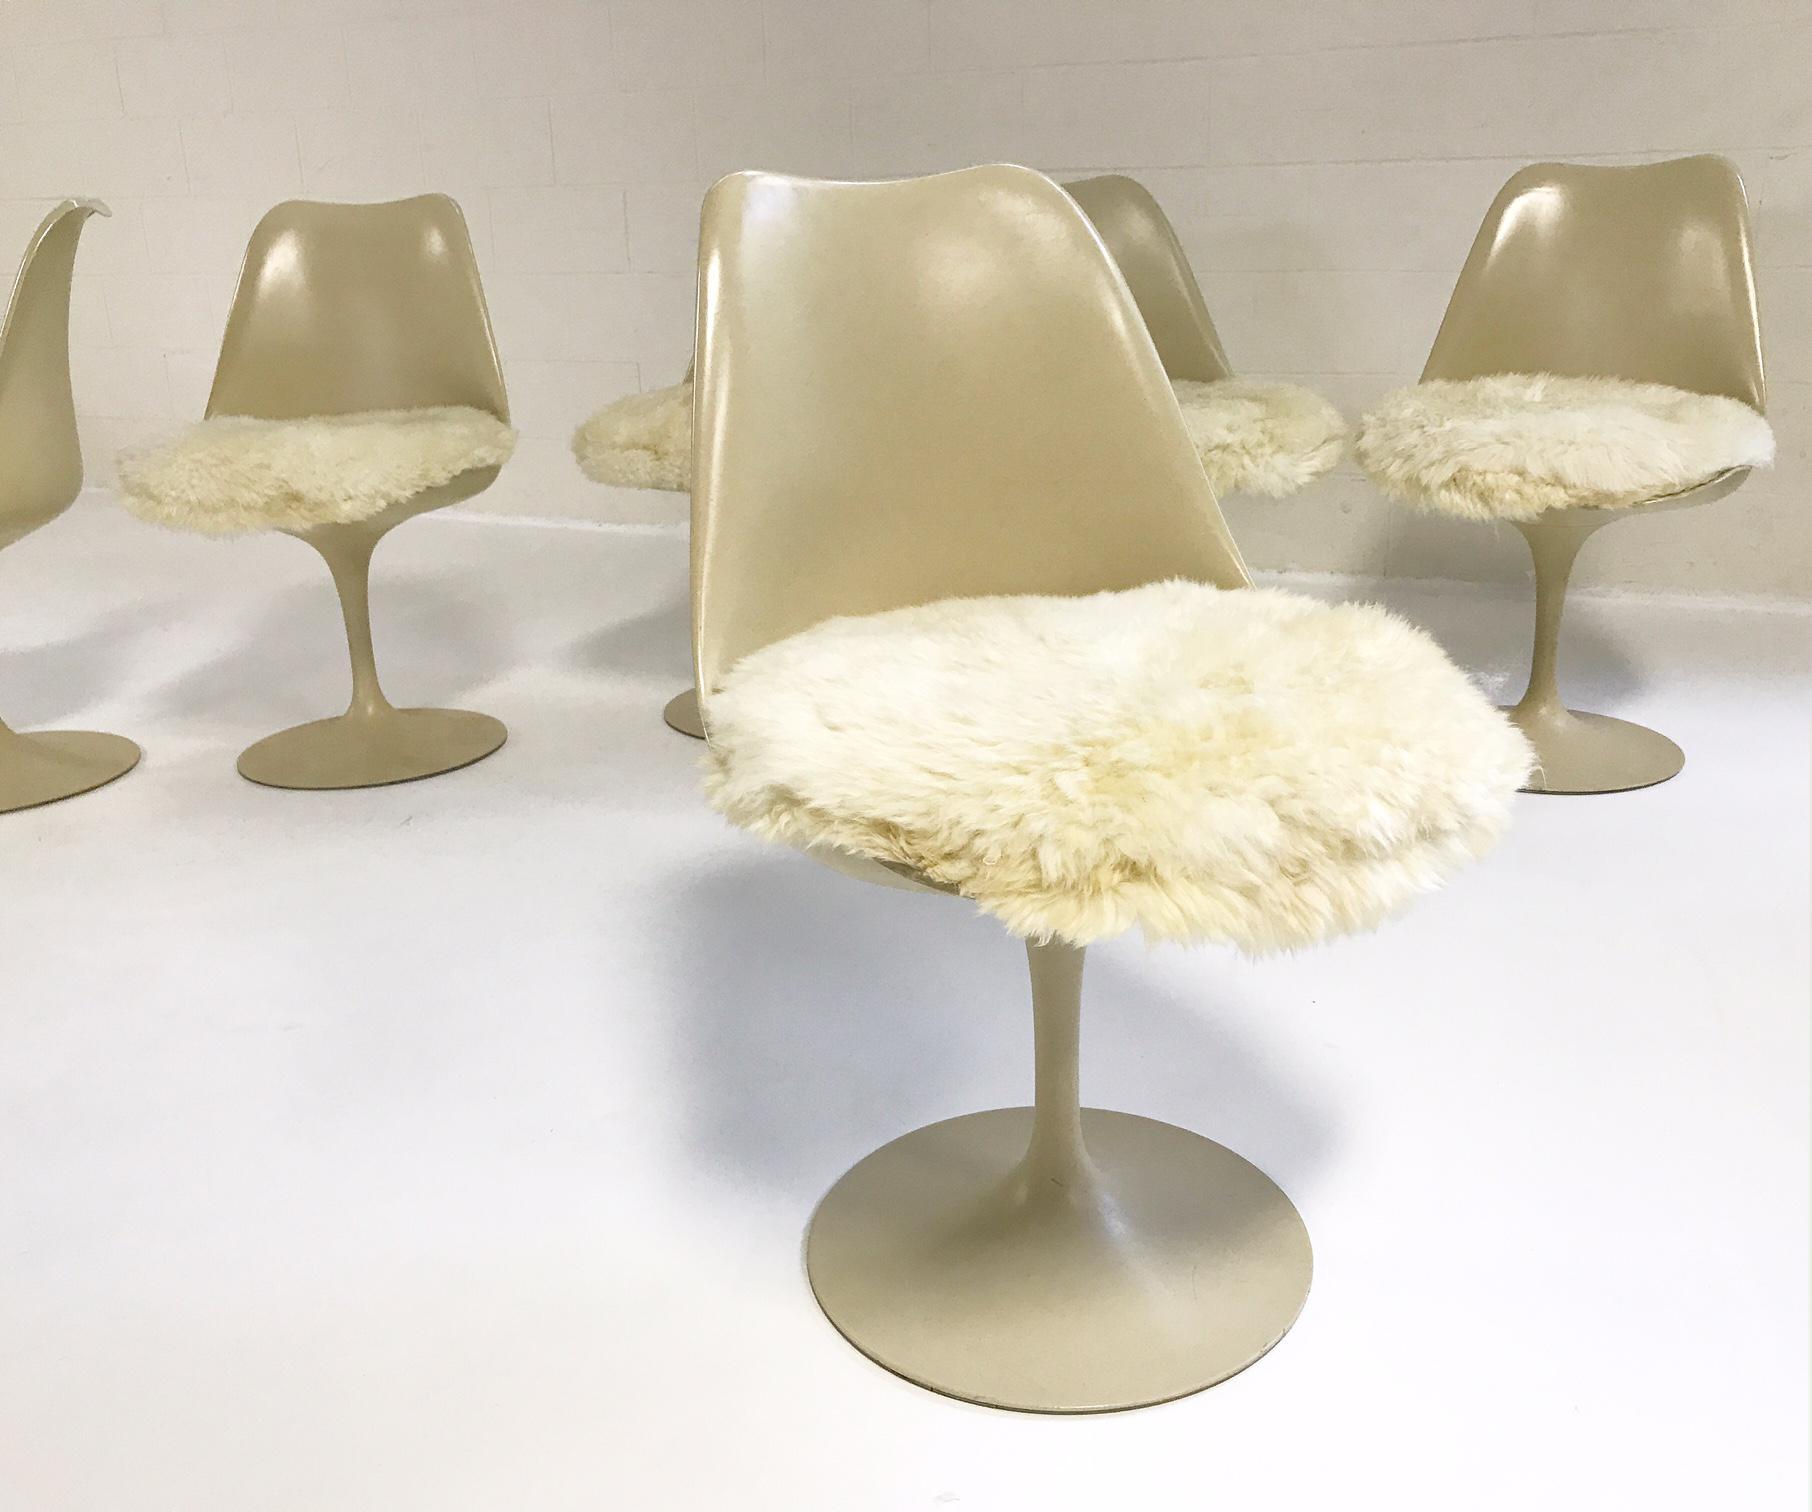 Animal Skin Eero Saarinen Tulip Chairs With Custom Brazilian Sheepskin  Cushions   Set Of 6 For